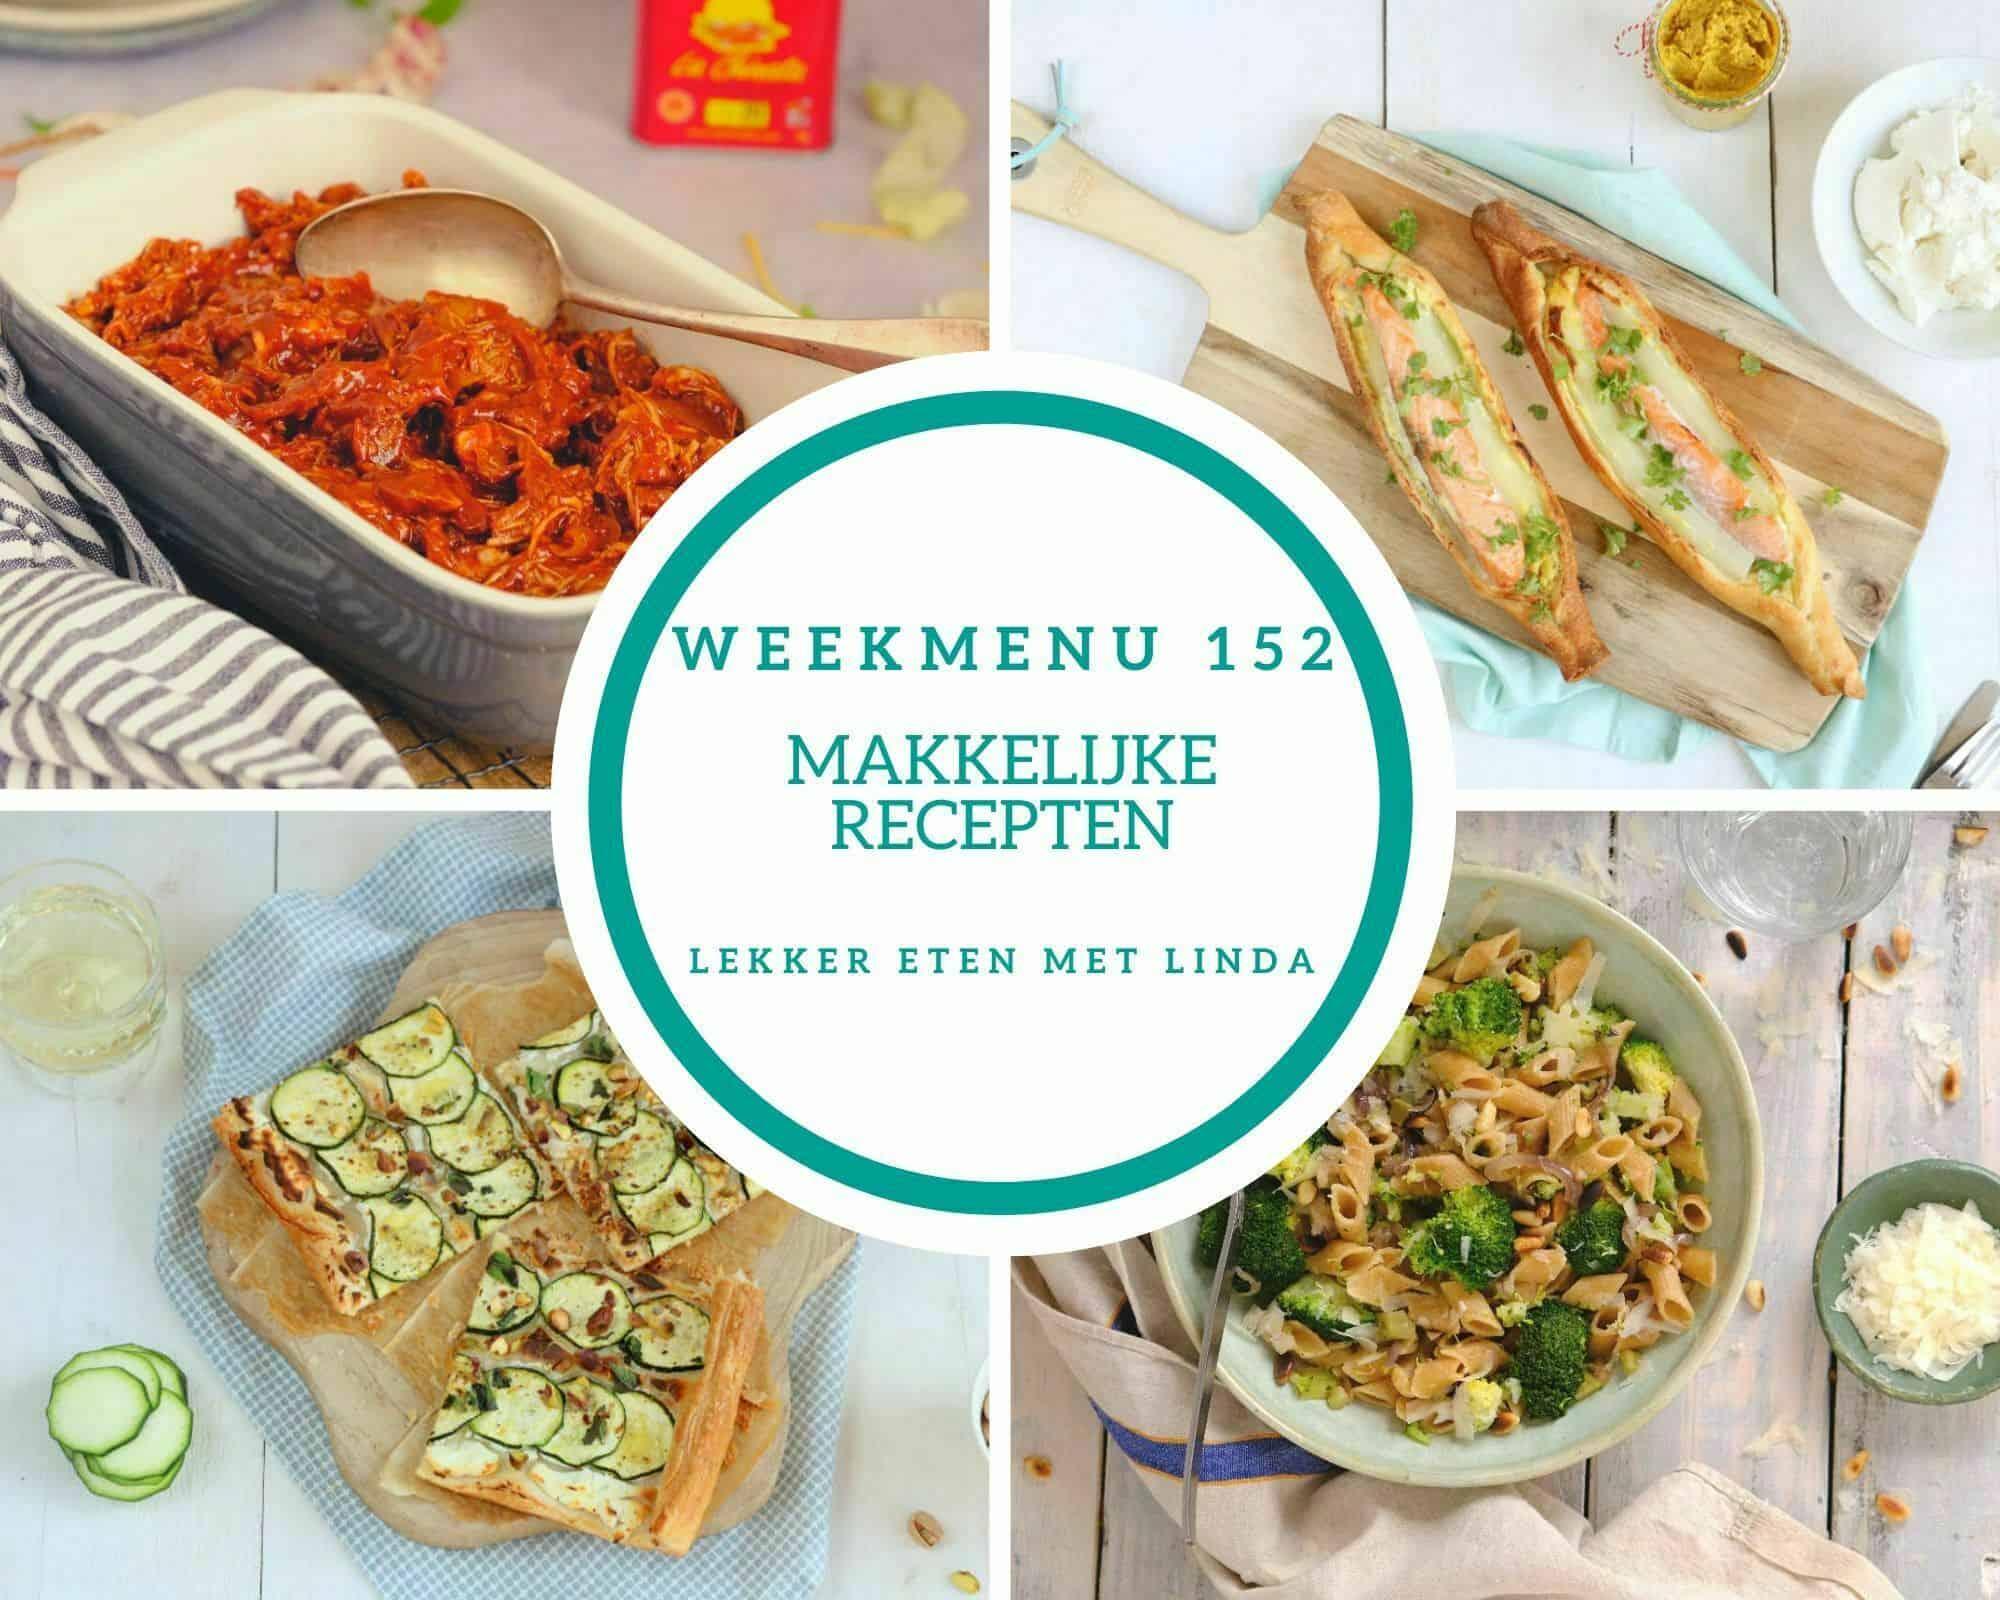 Weekmenu 152 makkelijke recepten